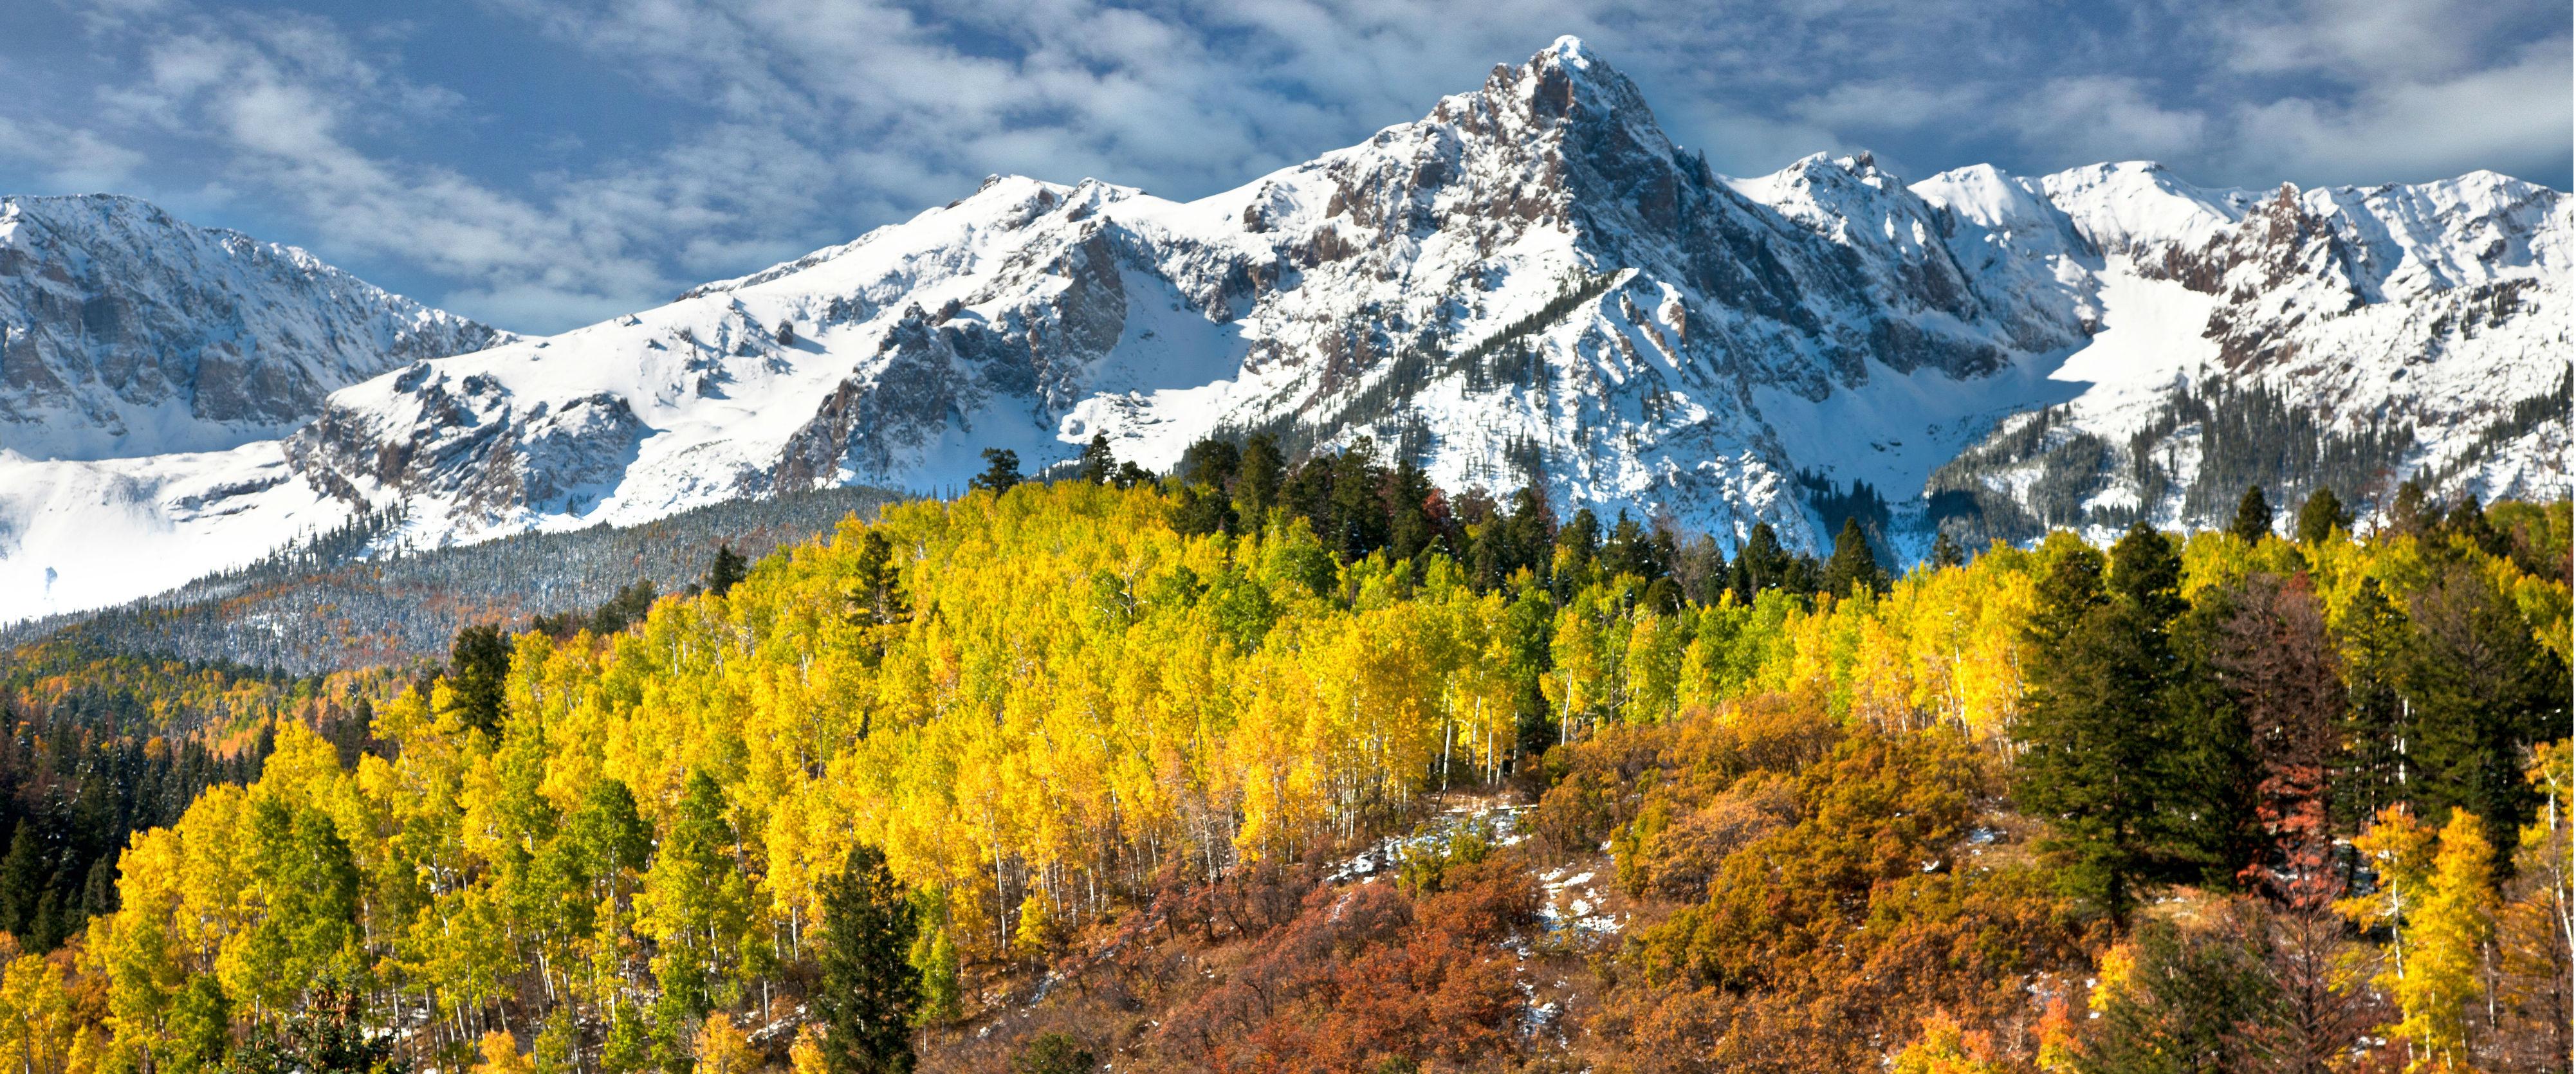 Free Desktop Wallpaper Fall Foliage 105 Oklahoma City To Denver Nonstop Into Ski Season